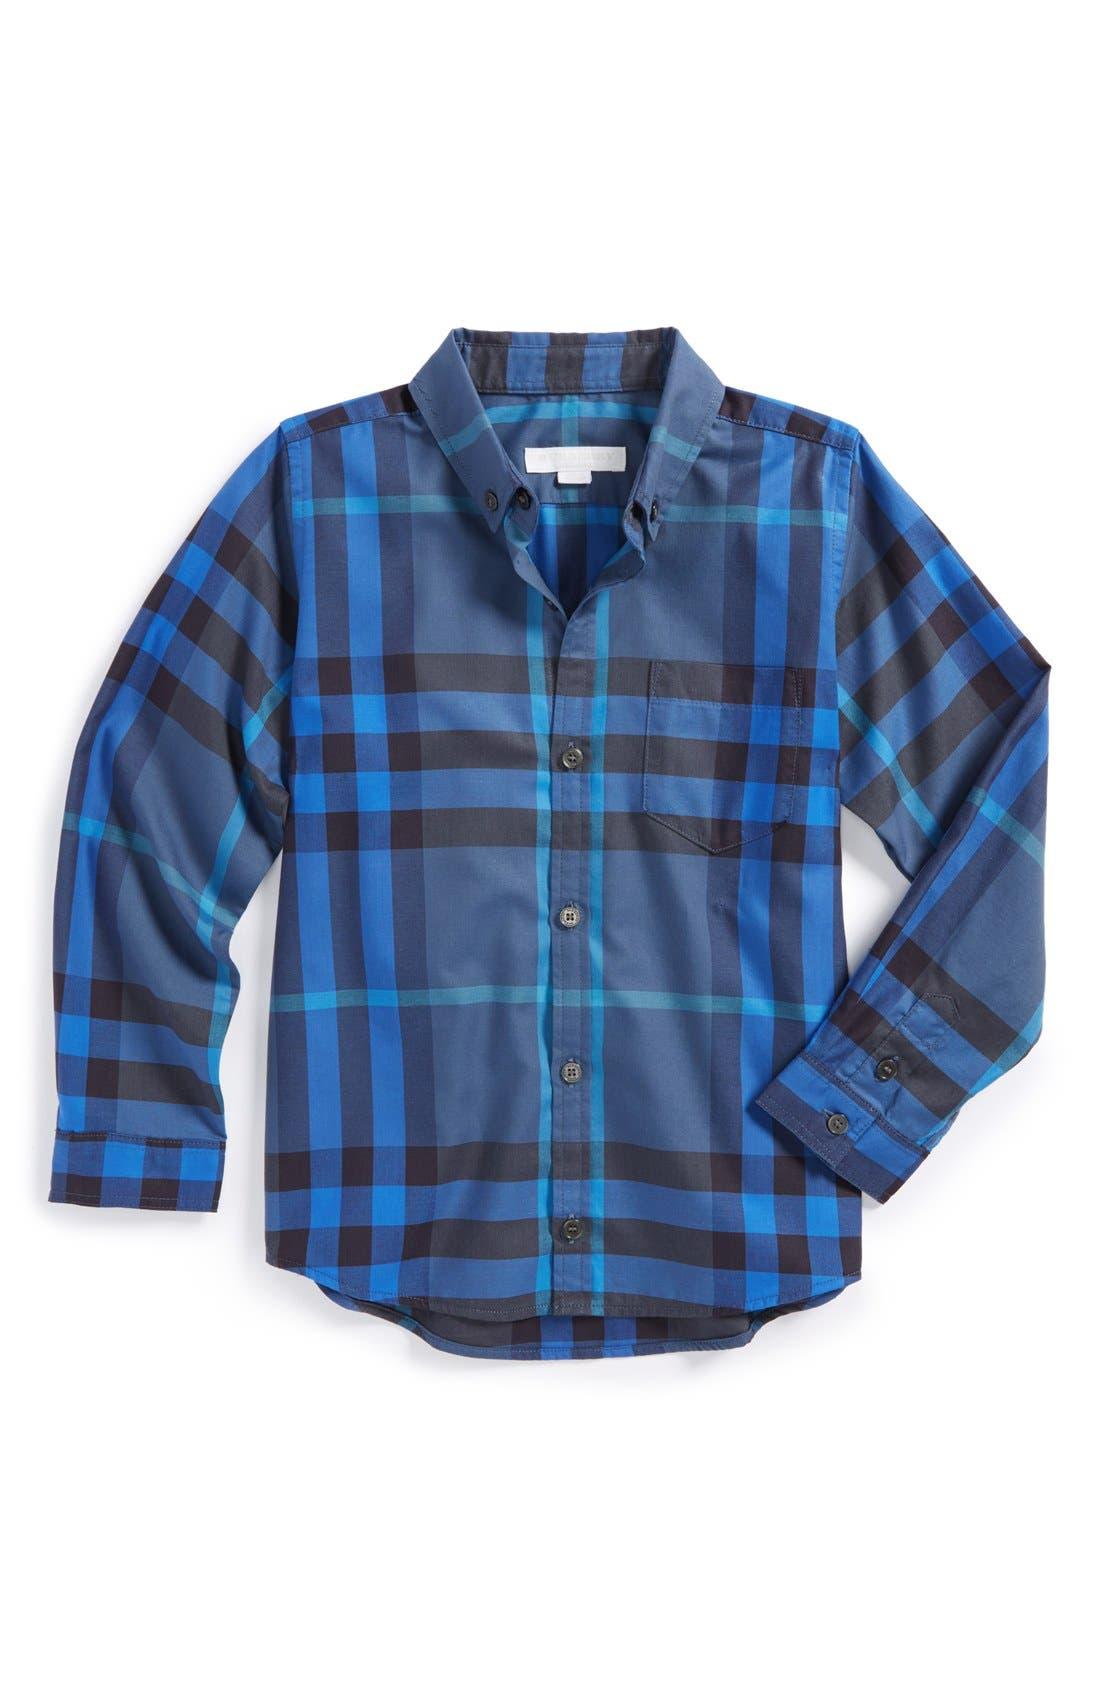 Main Image - Burberry 'Mini Fred' Check Print Woven Shirt (Little Boys & Big Boys)